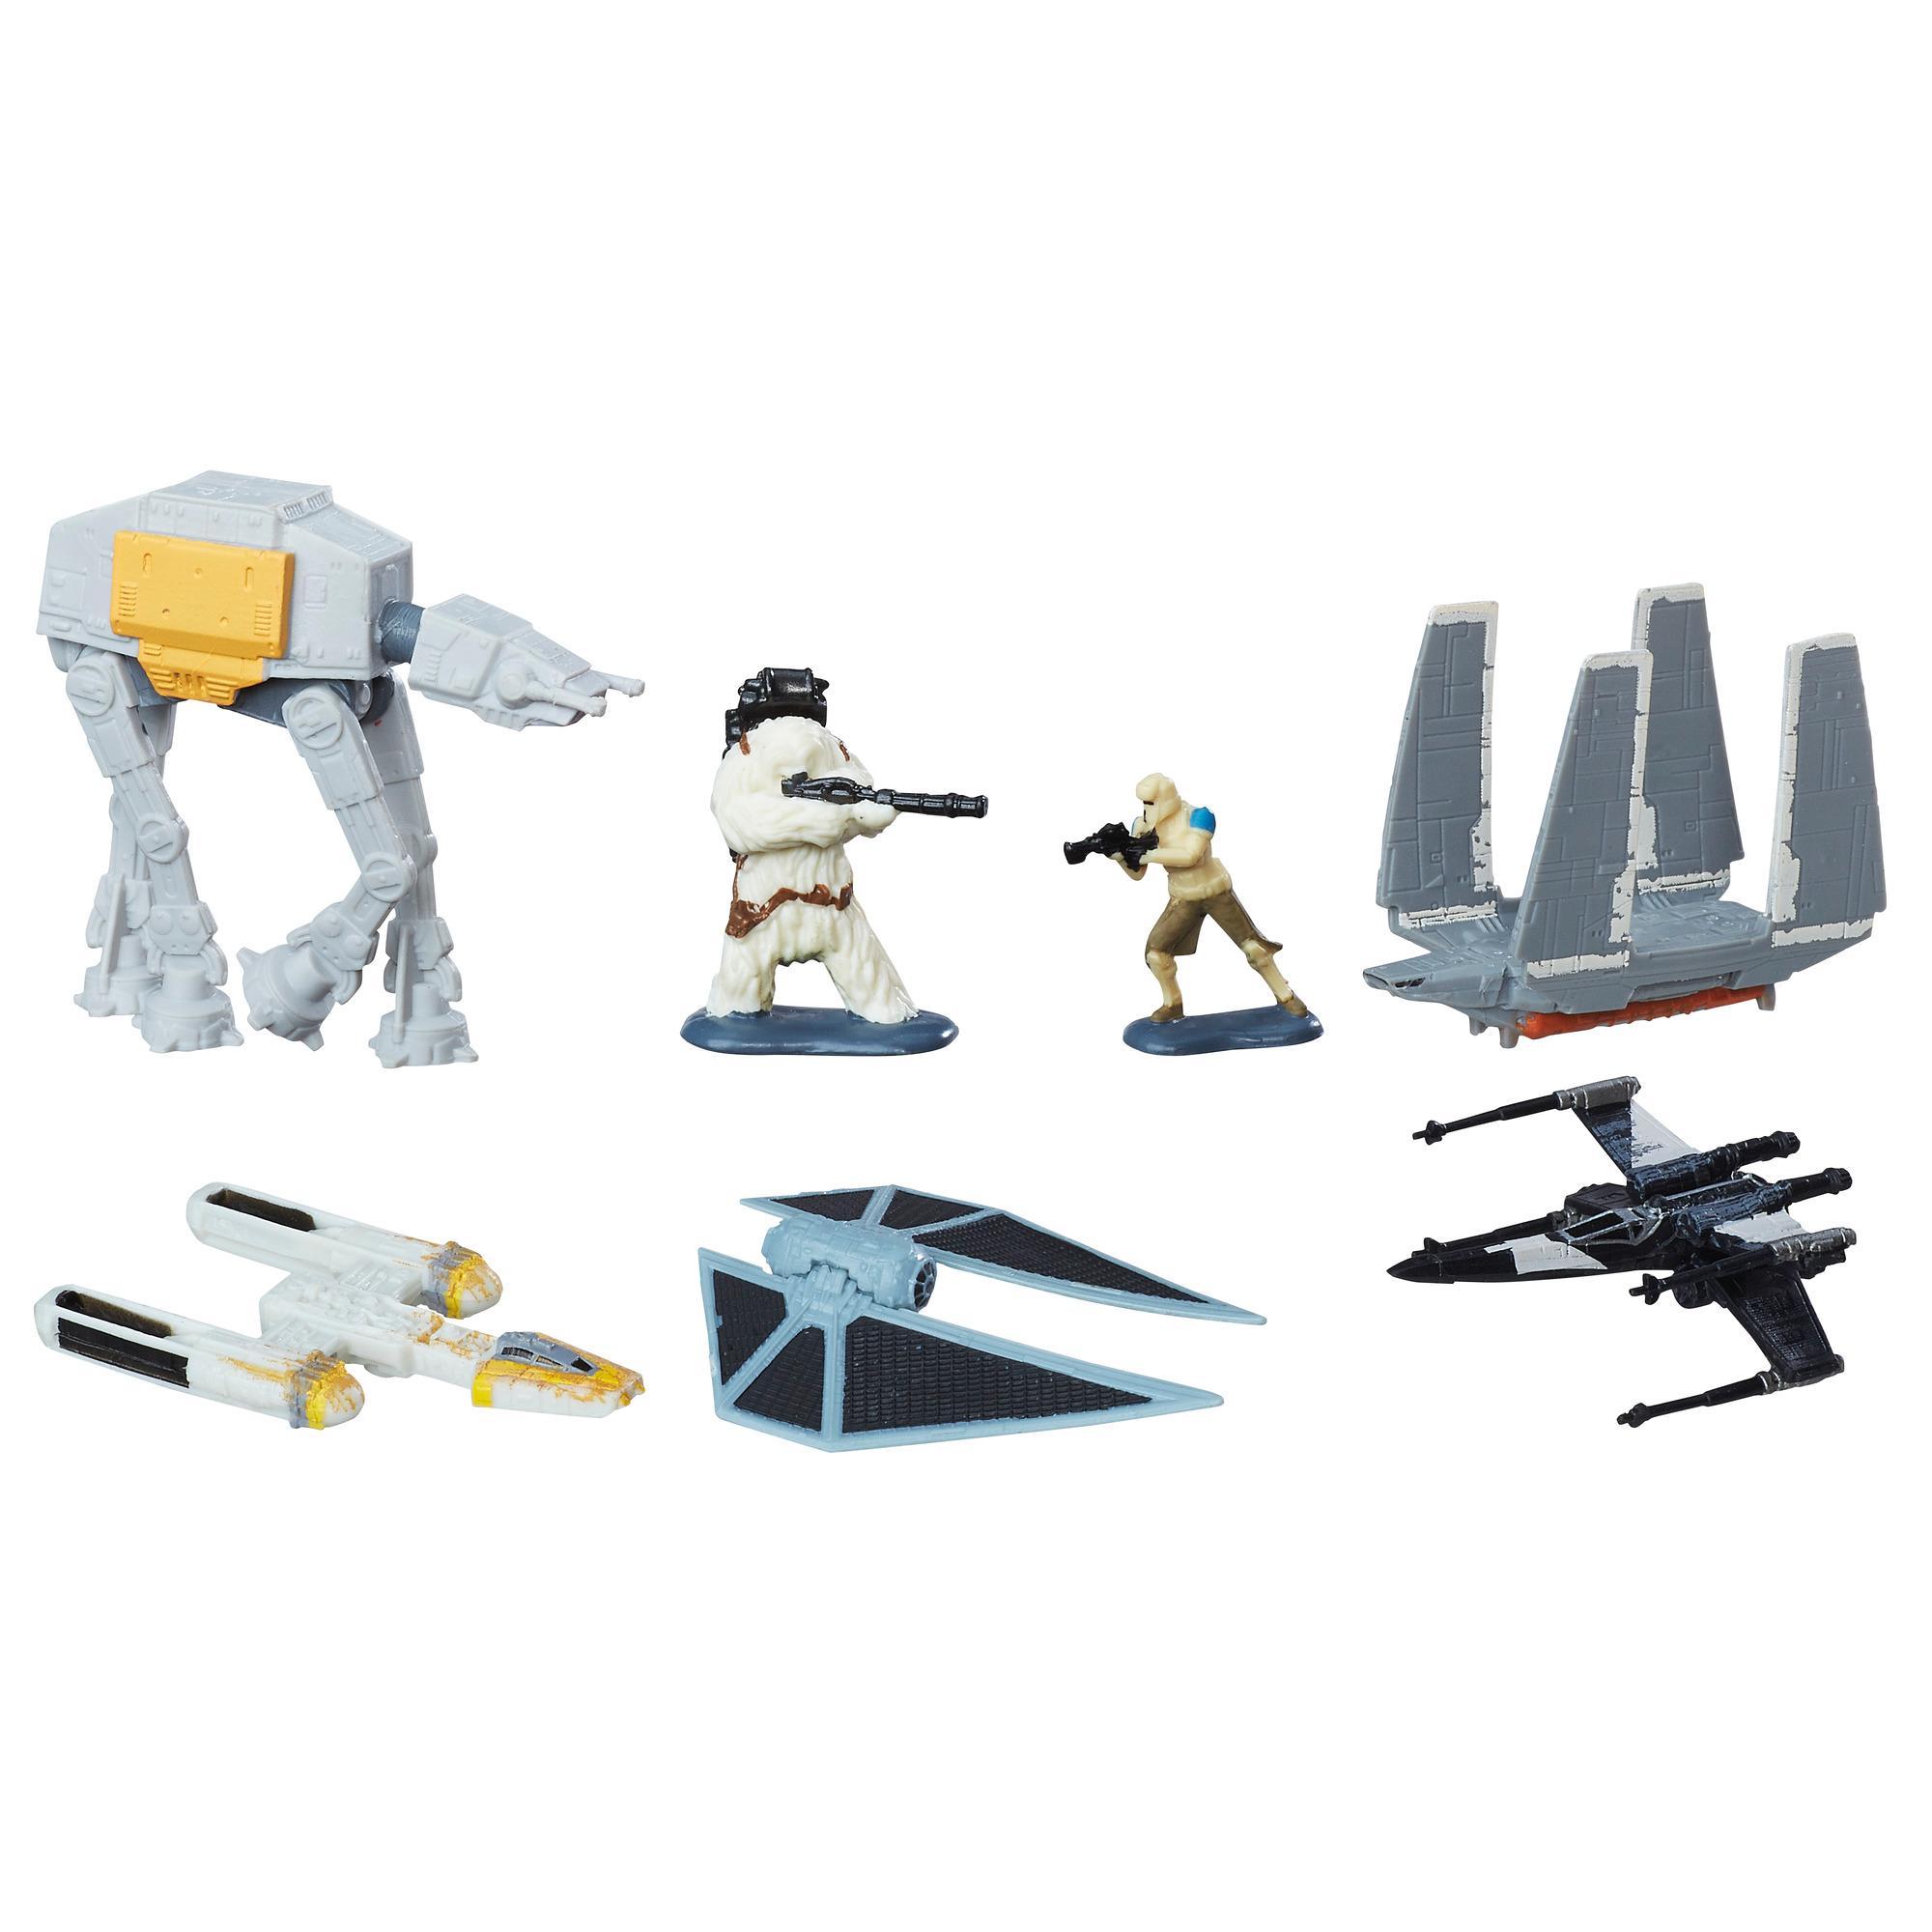 Star Wars: Rogue One Micro Machines - Ensemble de luxe Attaque sur Scarif